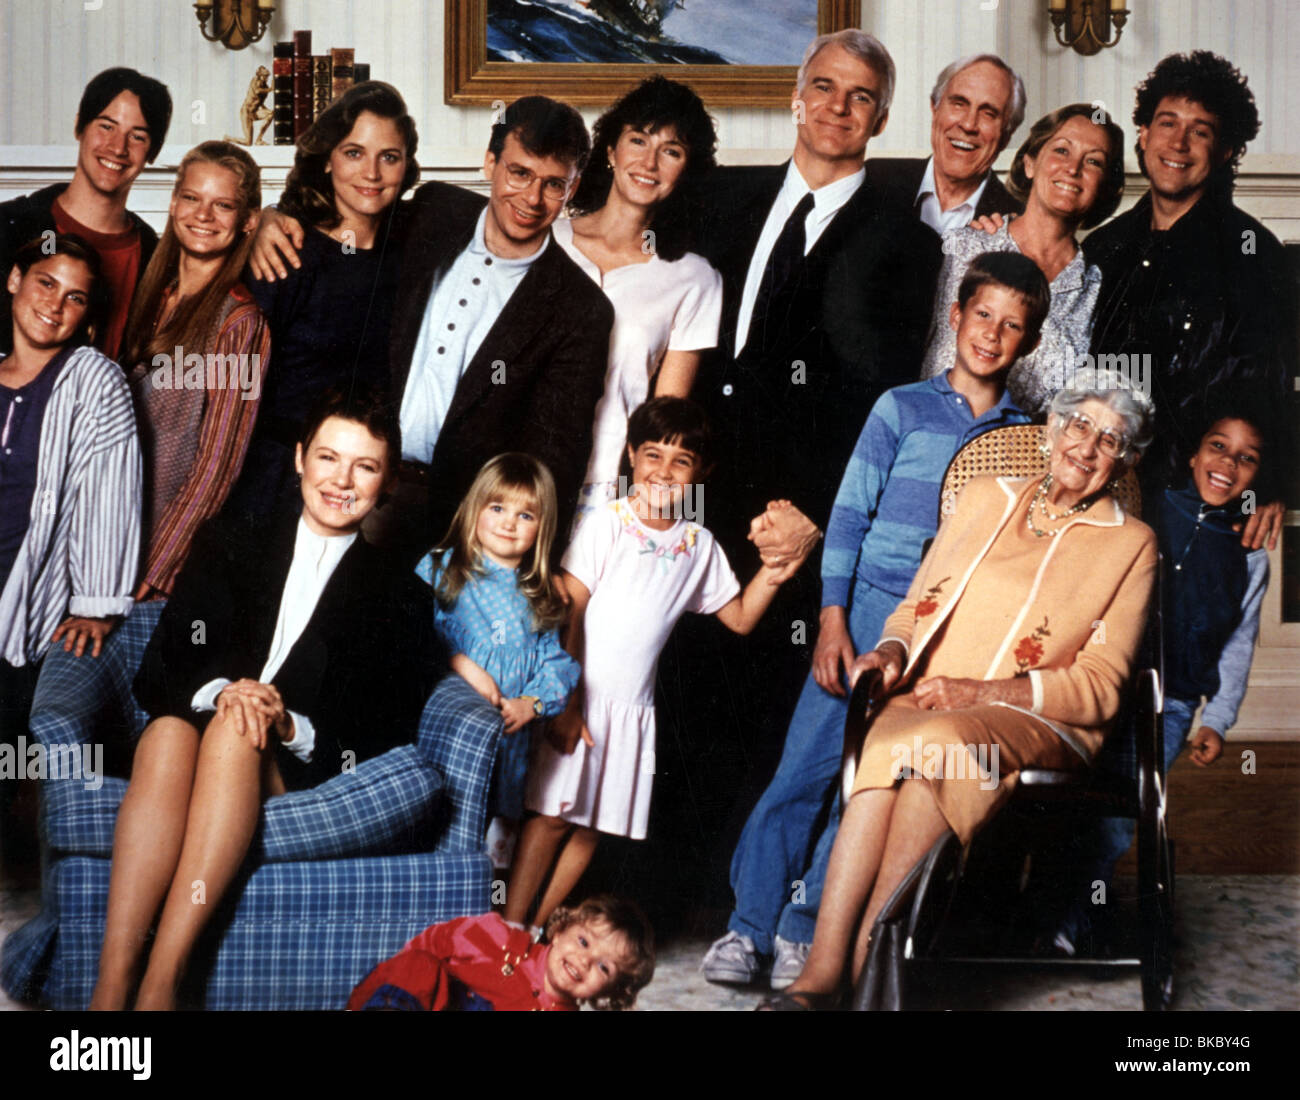 PARENTHOOD (1989) JOAQUIN PHOENIX (LEAF PHOENIX), KEANU ...